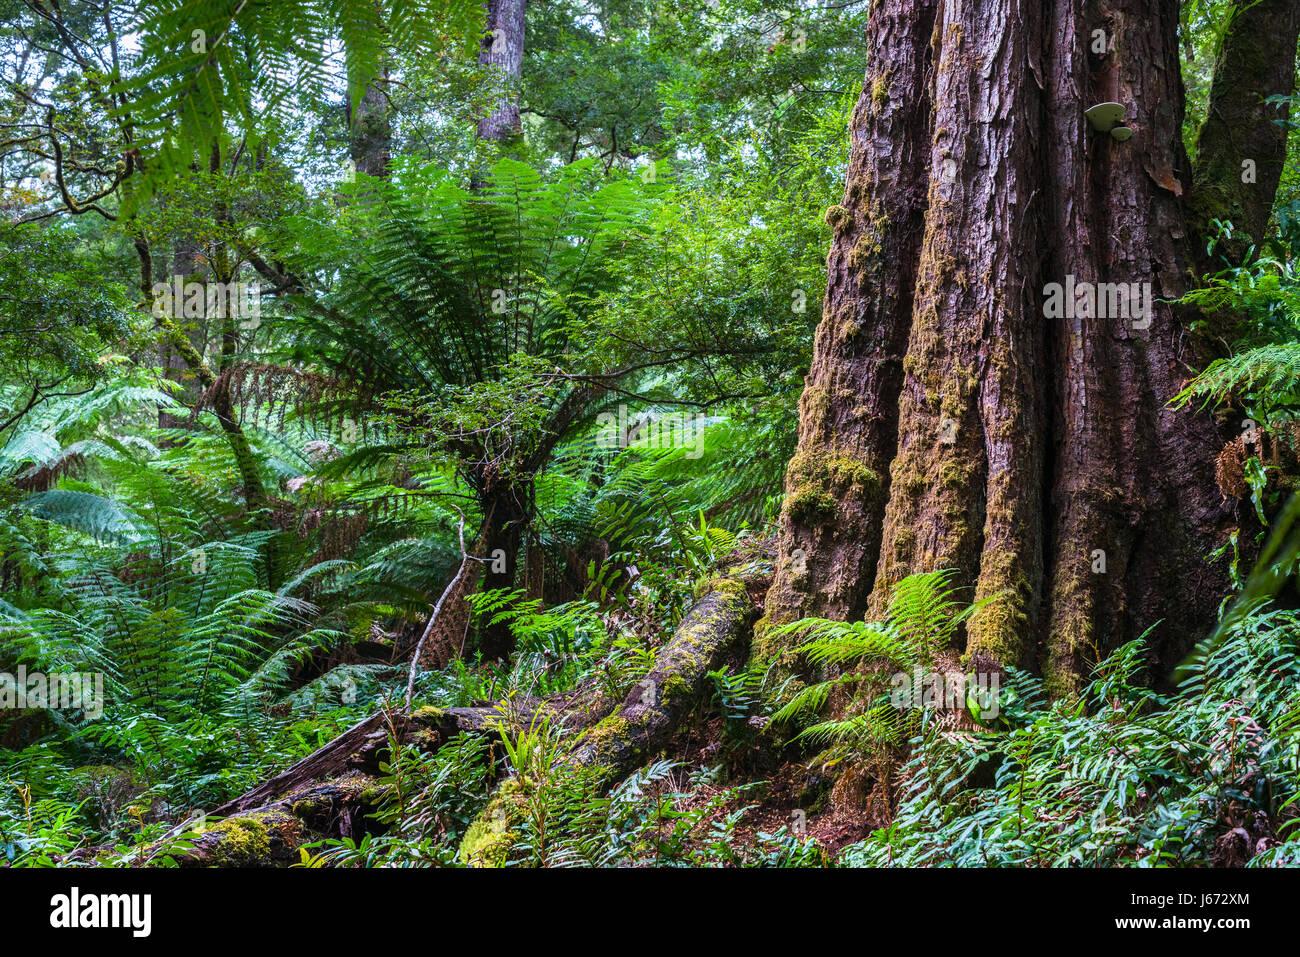 Dicksonia antarctica Regenwald an Melba Gully State Park, Great Otway National Park, Victoria, Australien. Stockbild